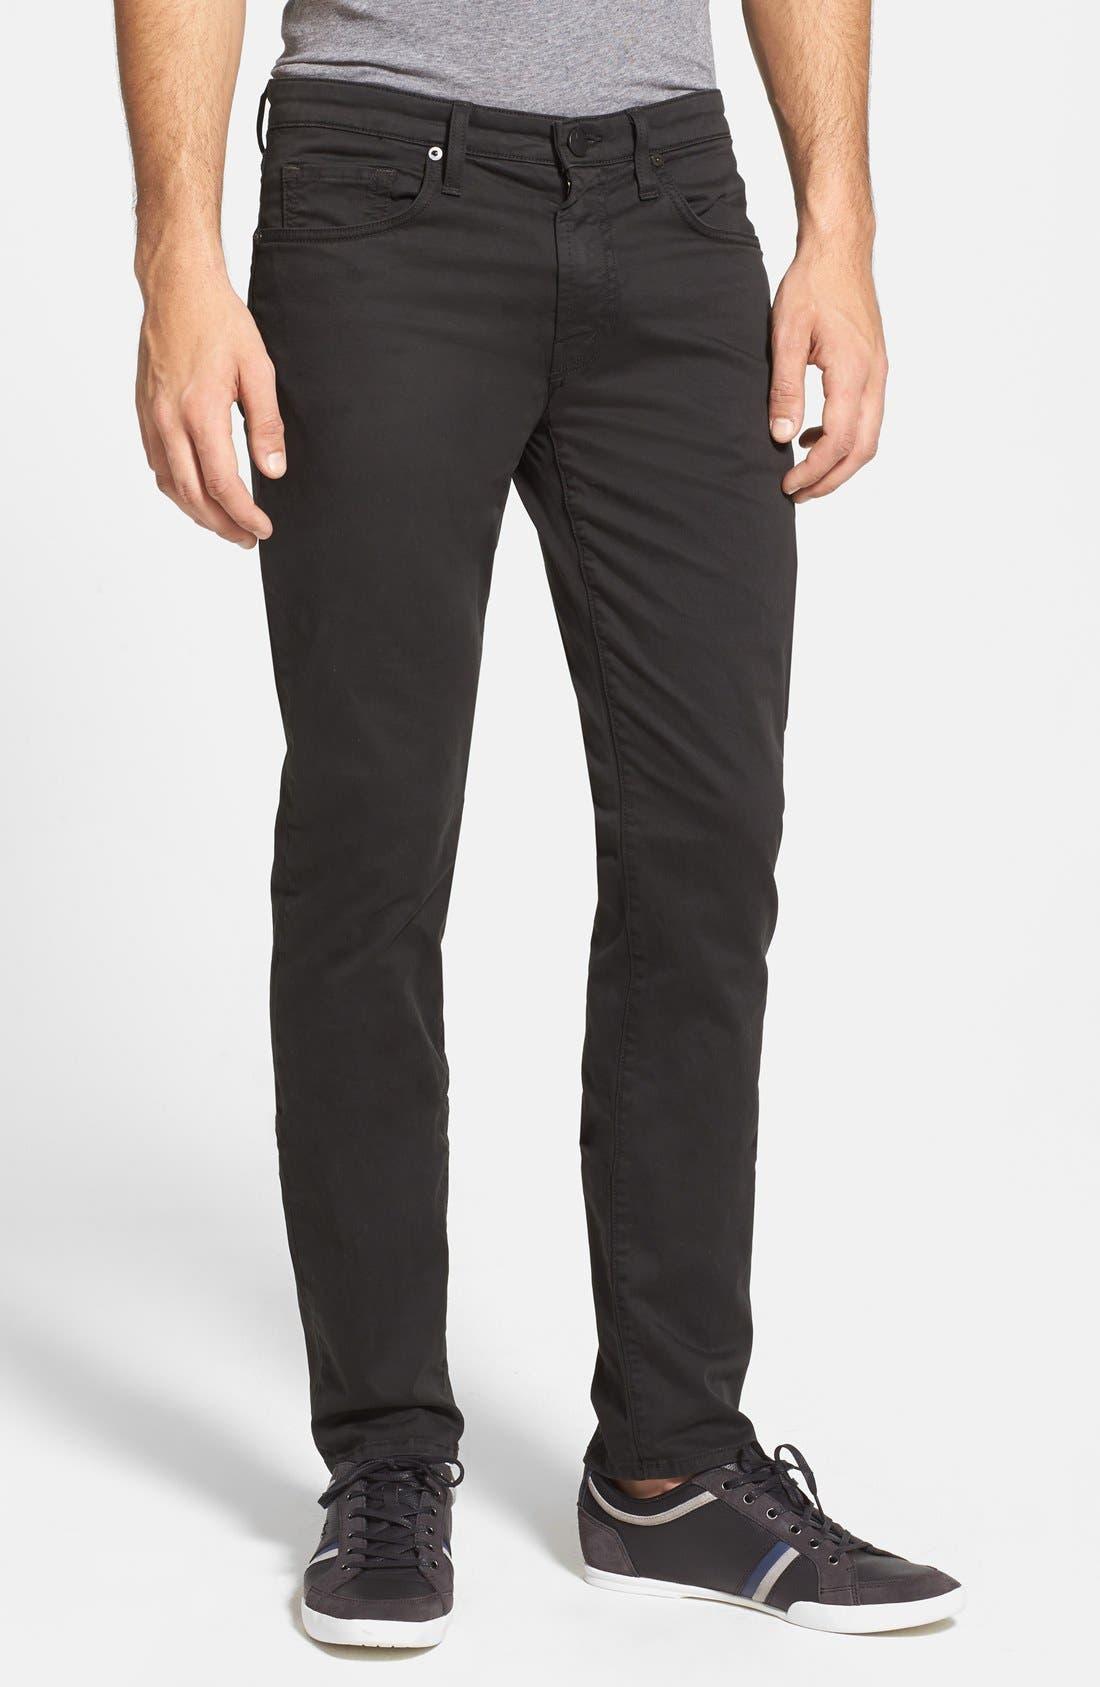 'Kane' Slim Fit Cotton Twill Pants,                             Main thumbnail 14, color,